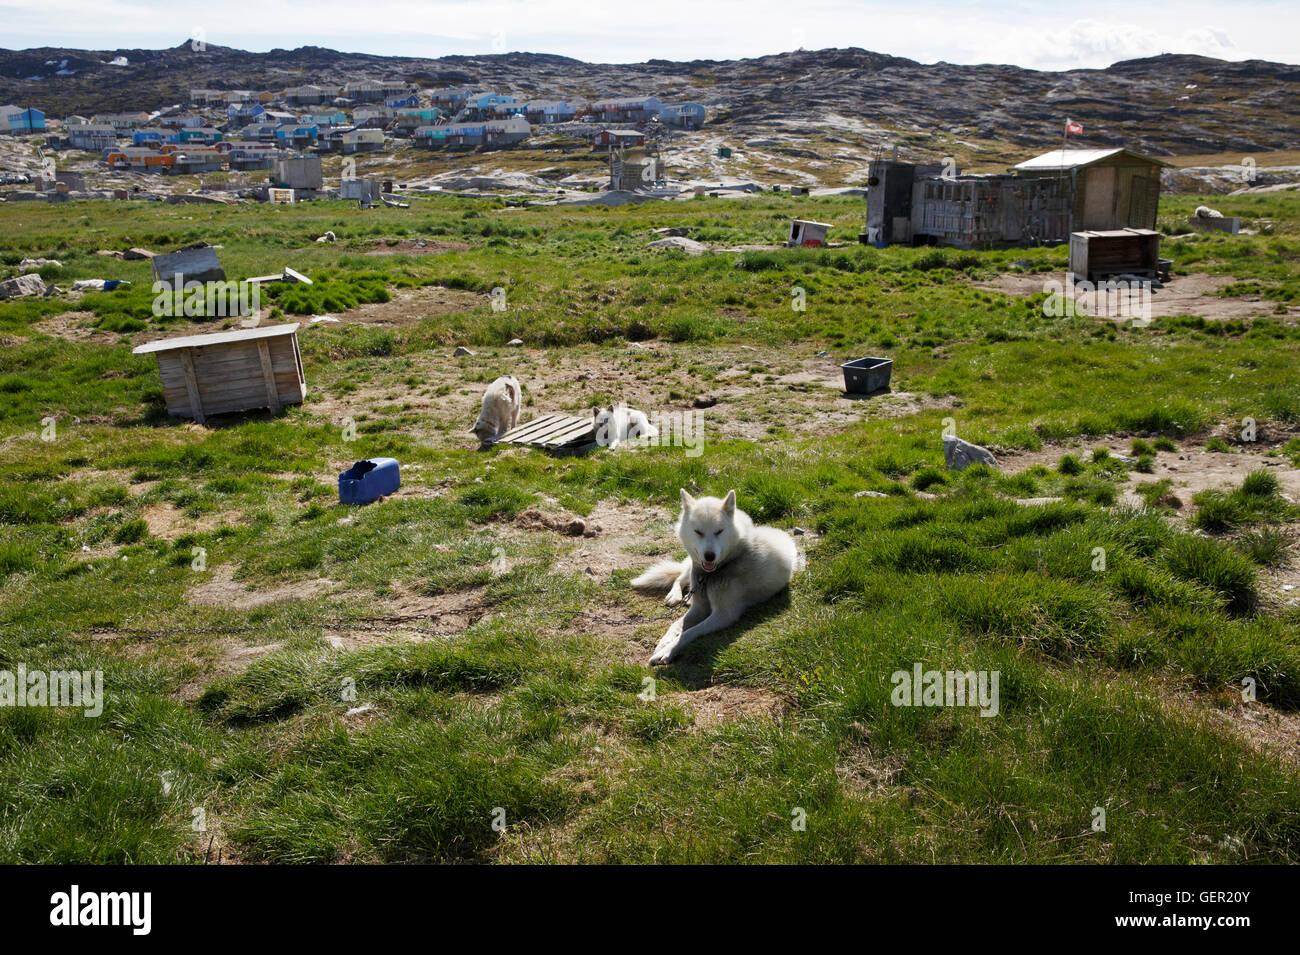 Sledge dog compound on the outskirts of Ilulissat, Greenland - Stock Image